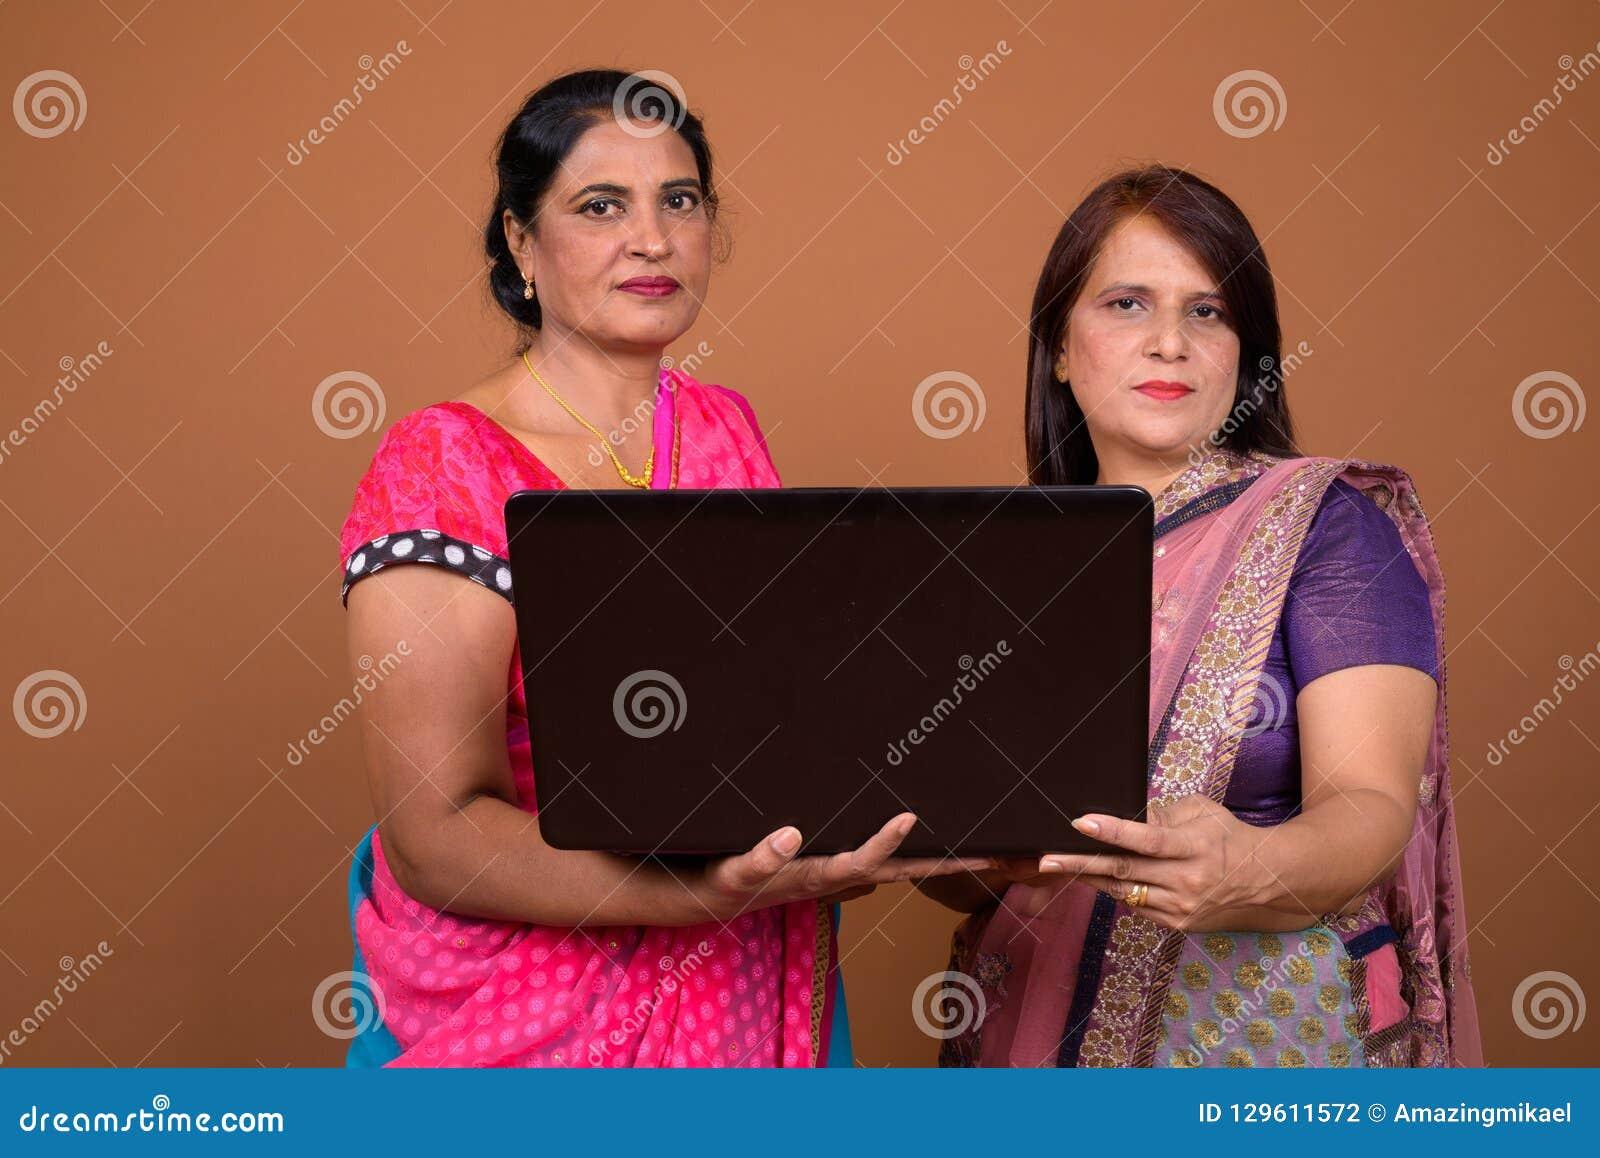 Tied Mature women